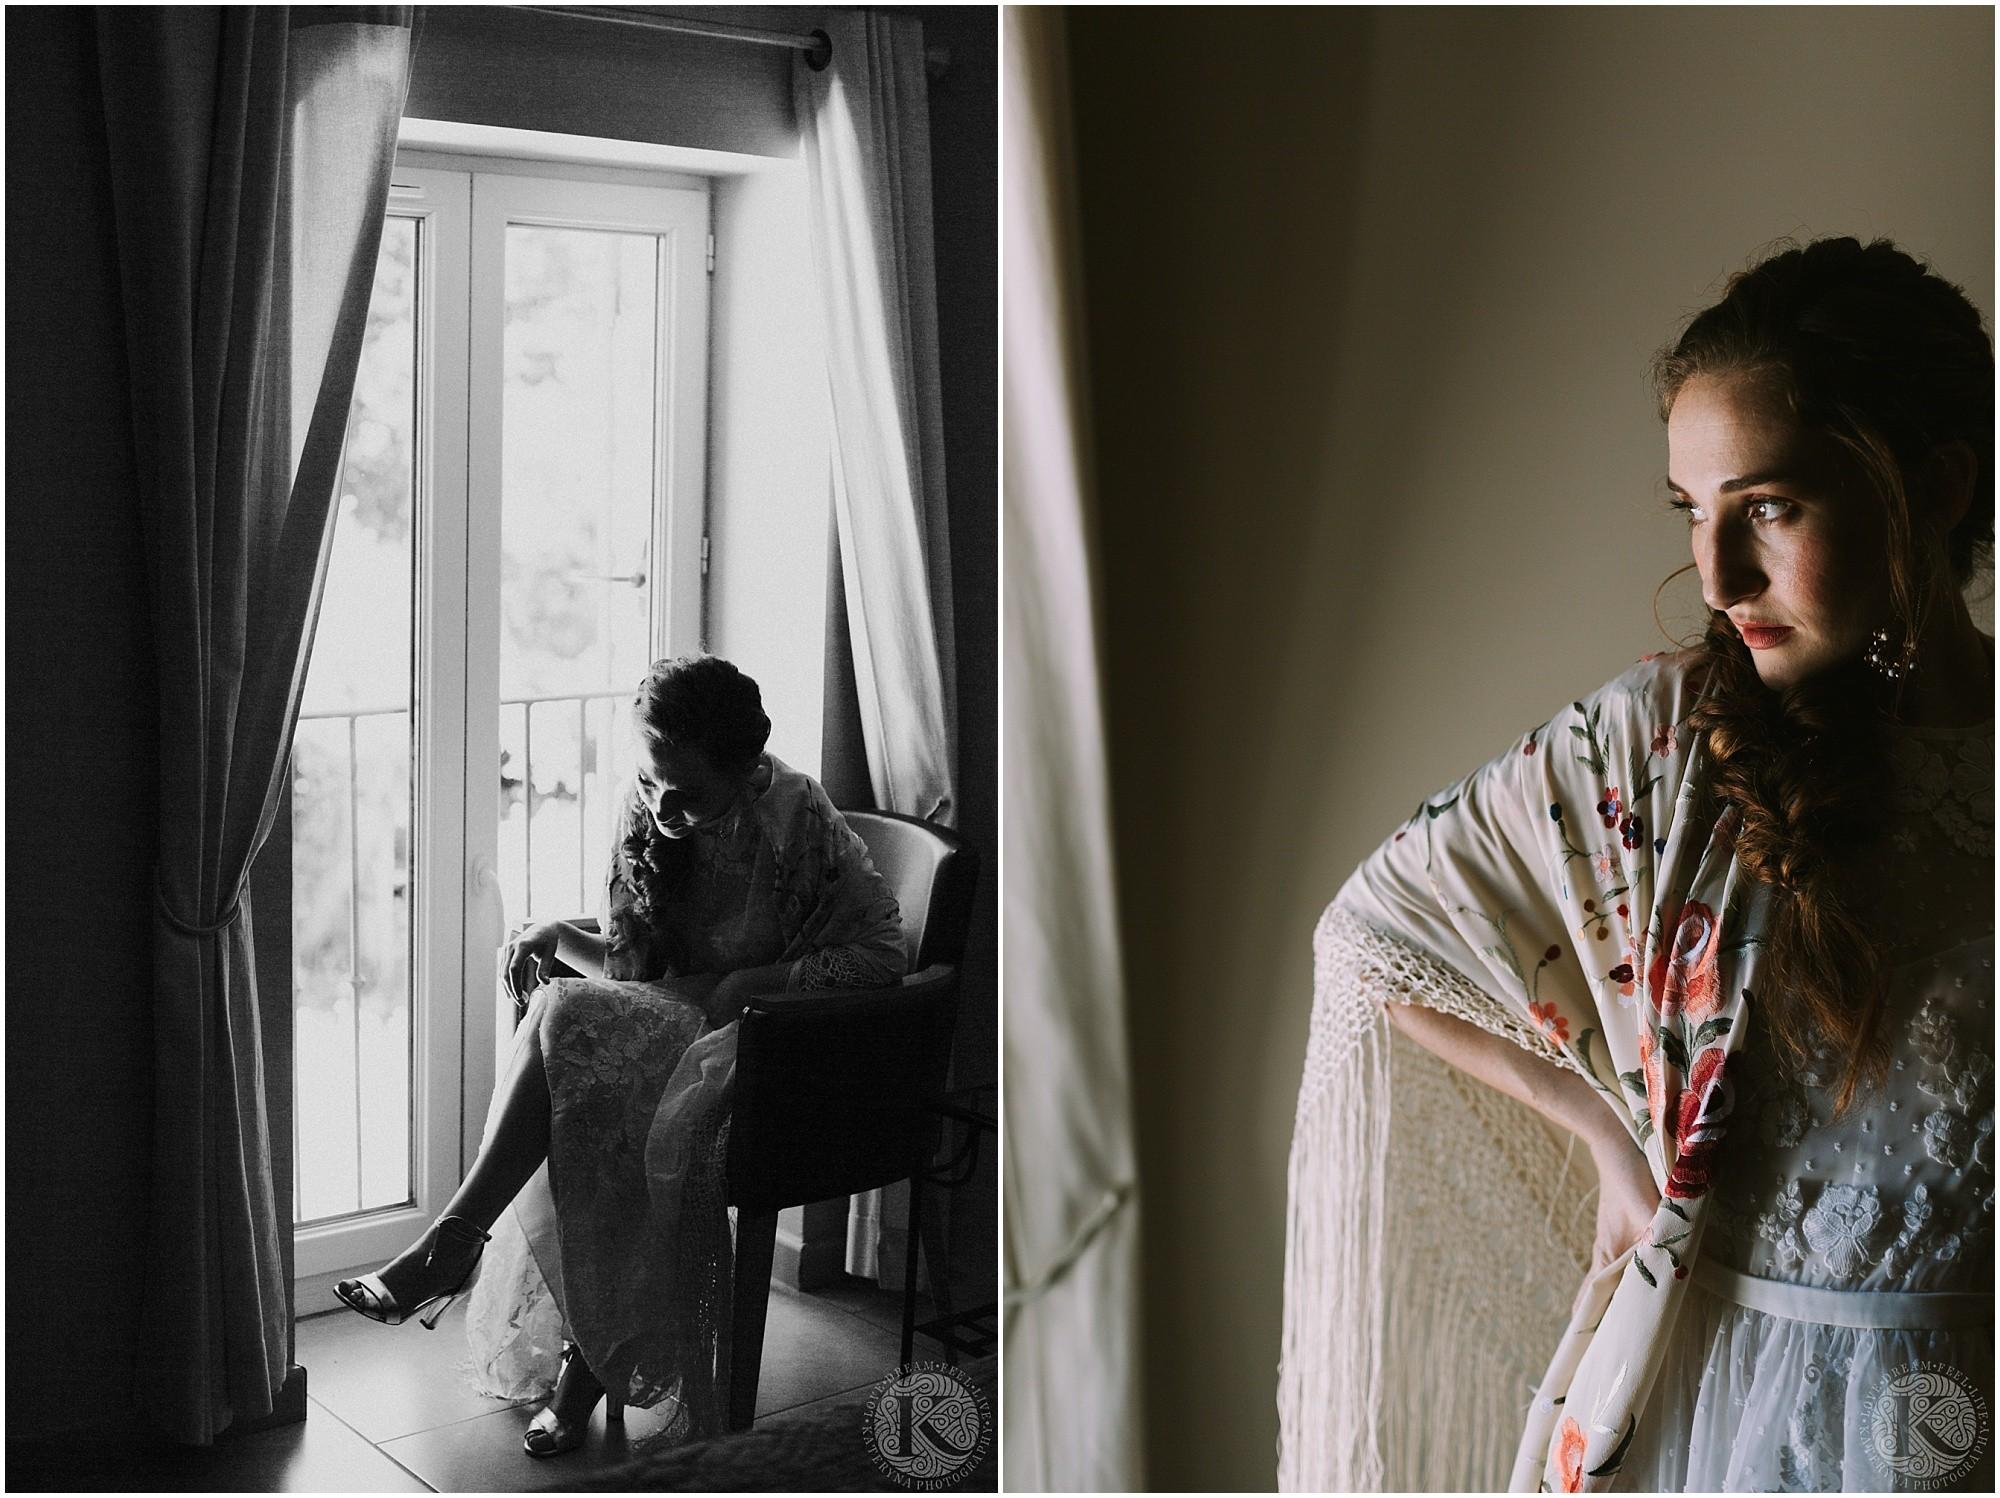 Kateryna-photos-photographe-mariage-vaucluse-provence-avignon-ferme-st-hugues_0024.jpg